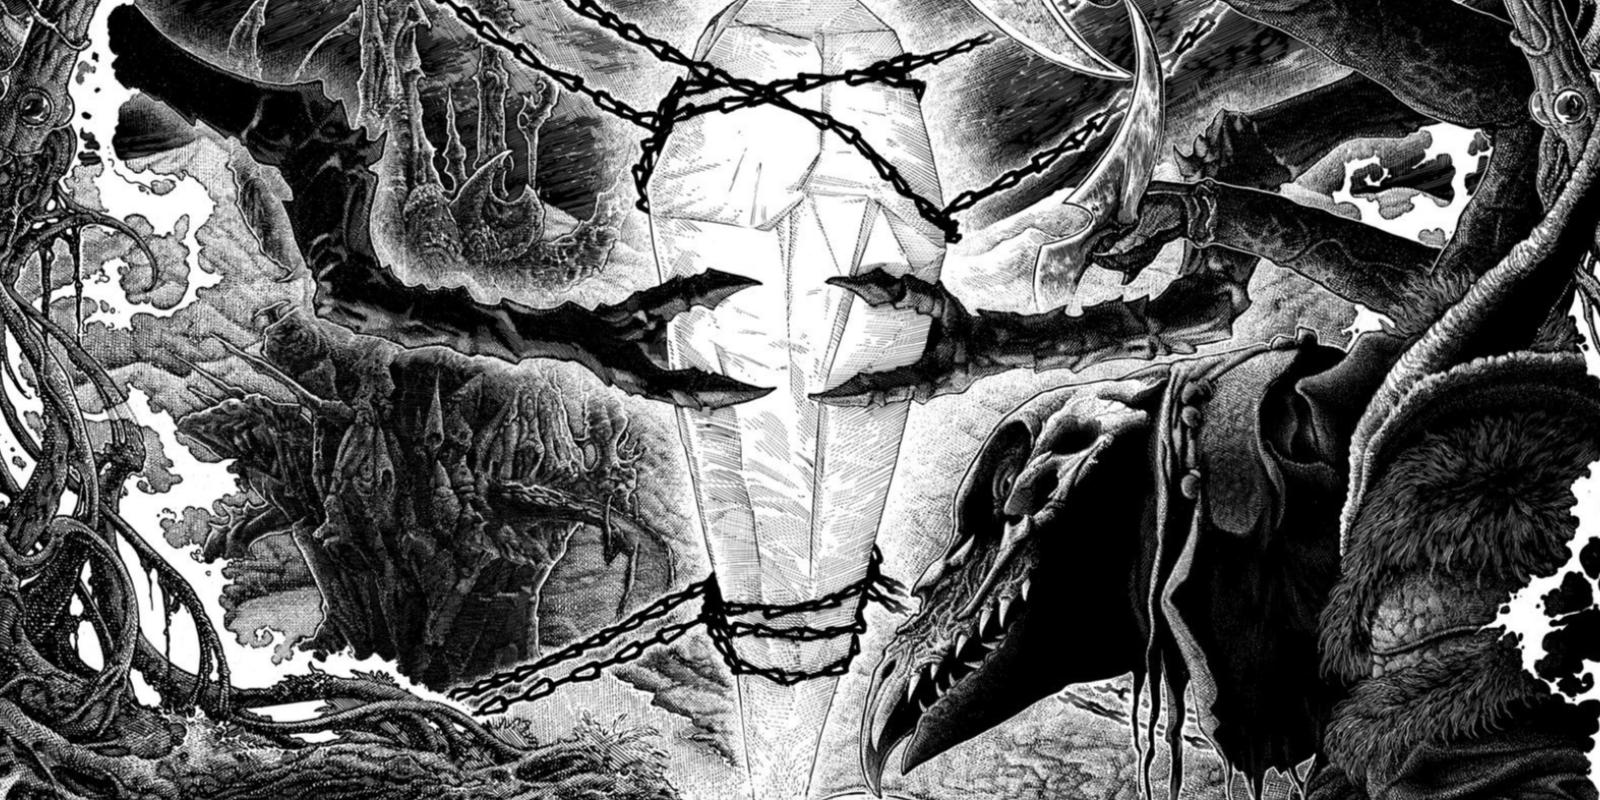 Joe Manganiello Explains Why The Dark Crystal Remains a Fantasy Classic